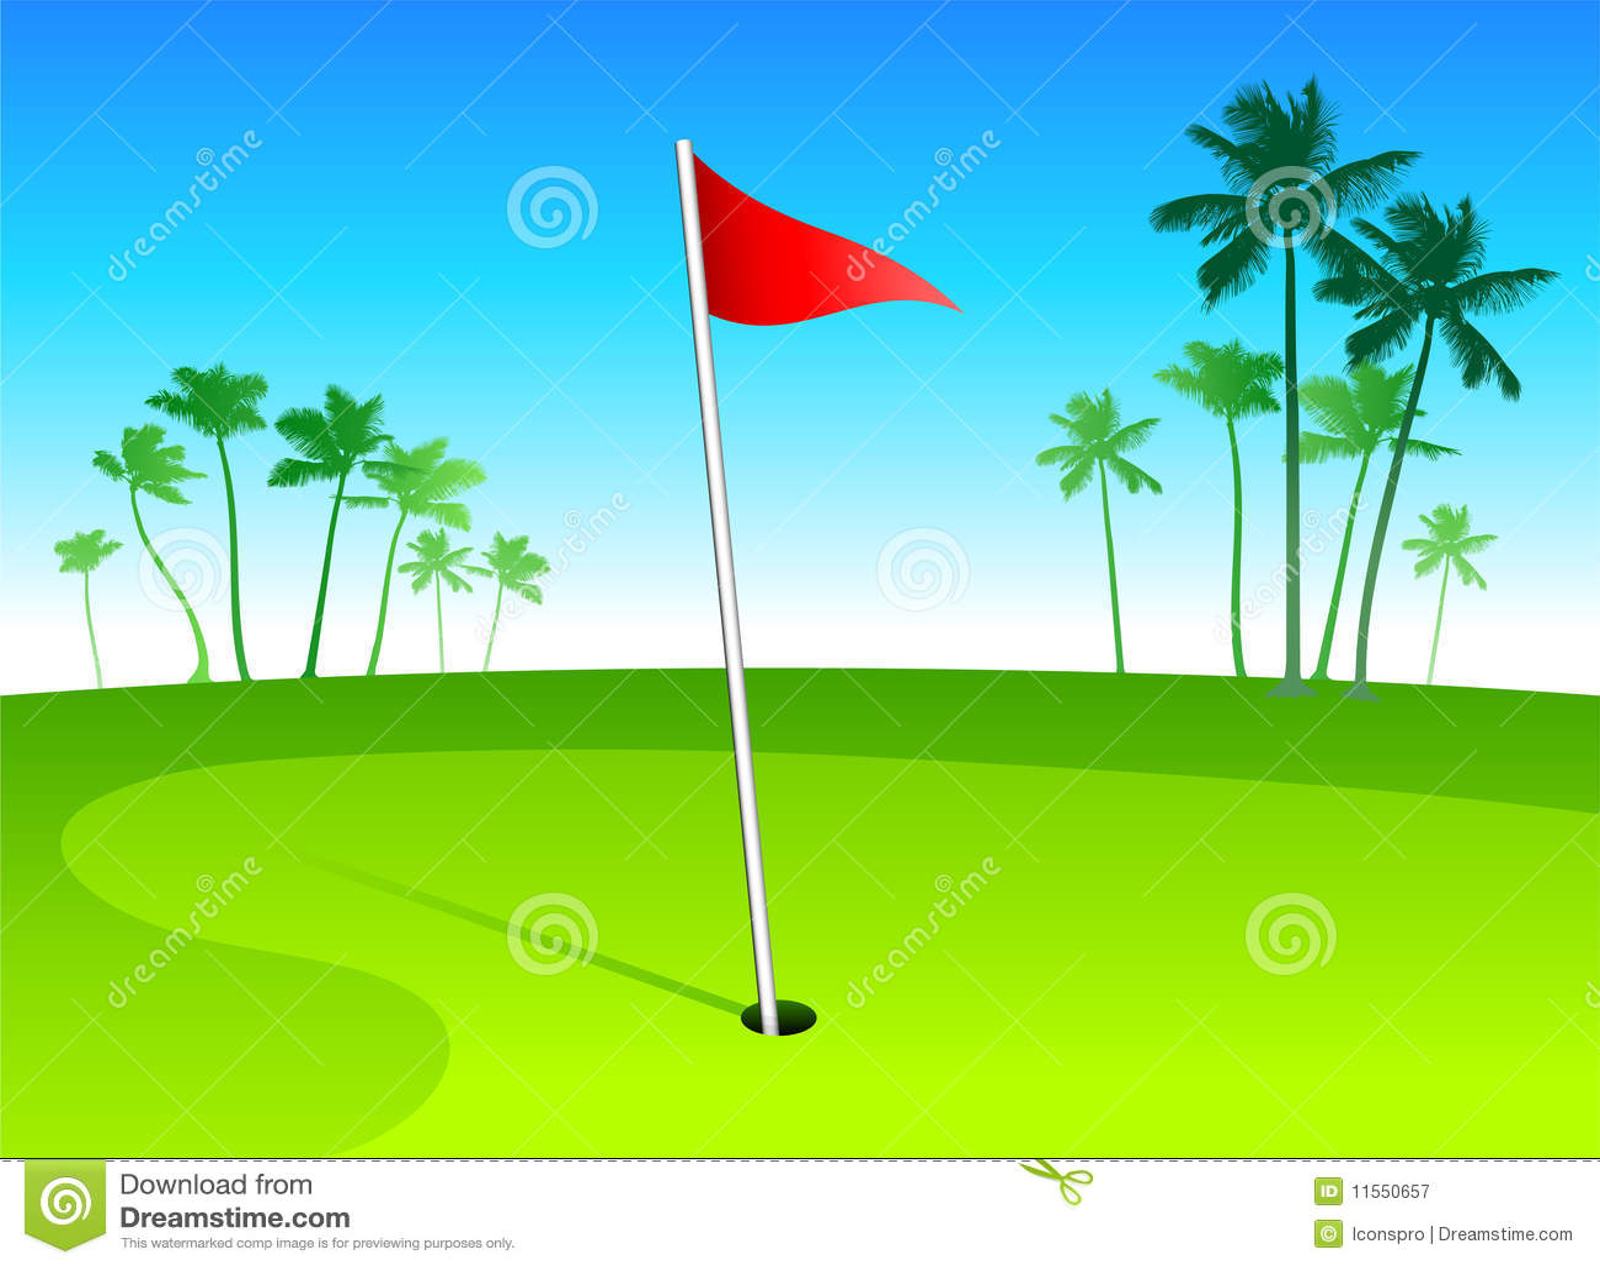 Sky Golf Stock Illustrations 1 799 Sky Golf Stock Illustrations Vectors Clipart Dreamstime